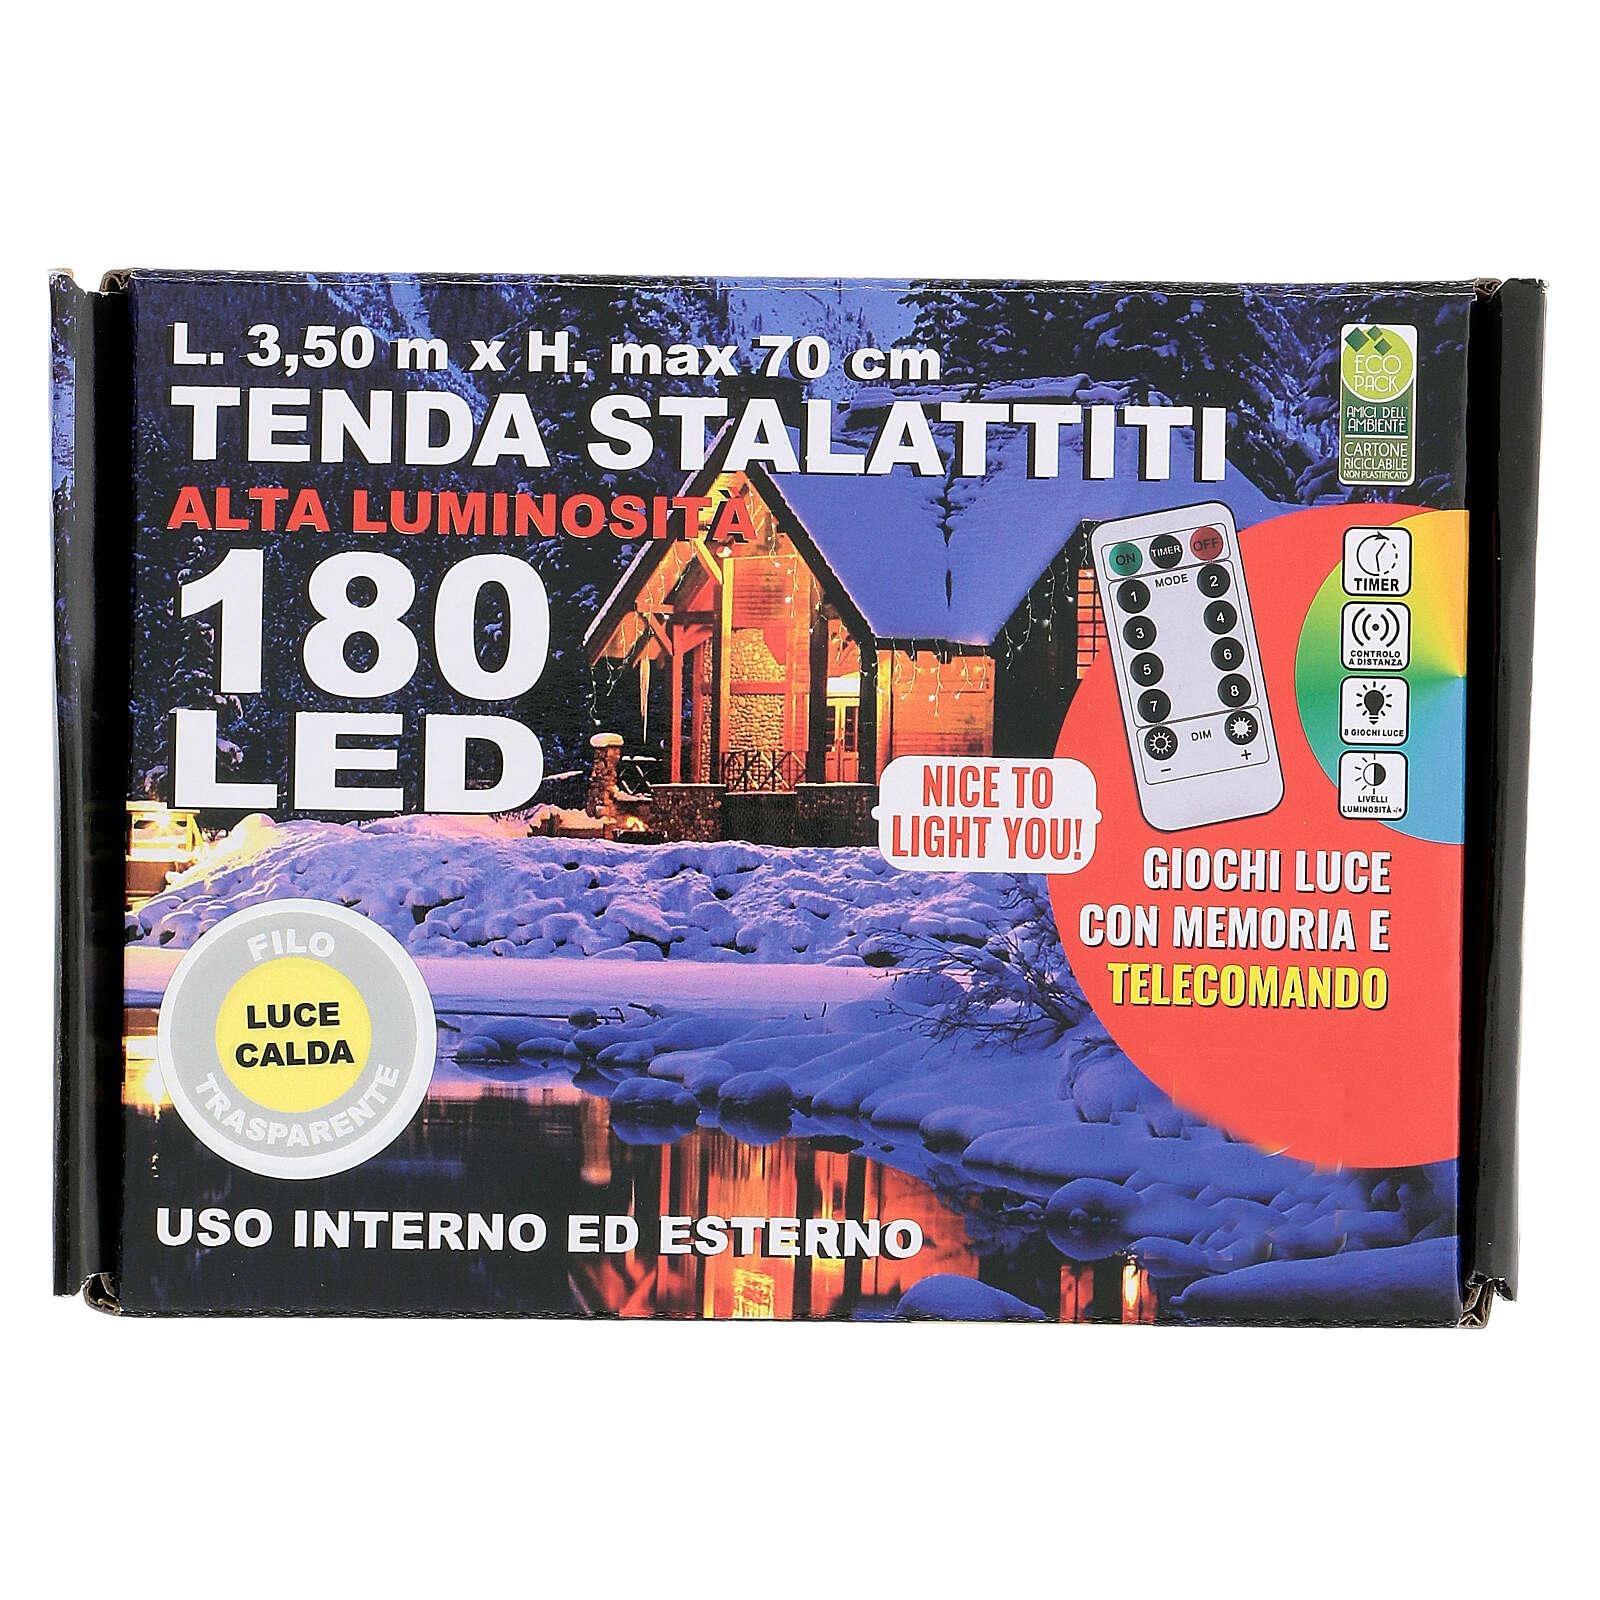 Tenda 3,5 m stalattiti 180 led telecomando luce calda interno esterno 4